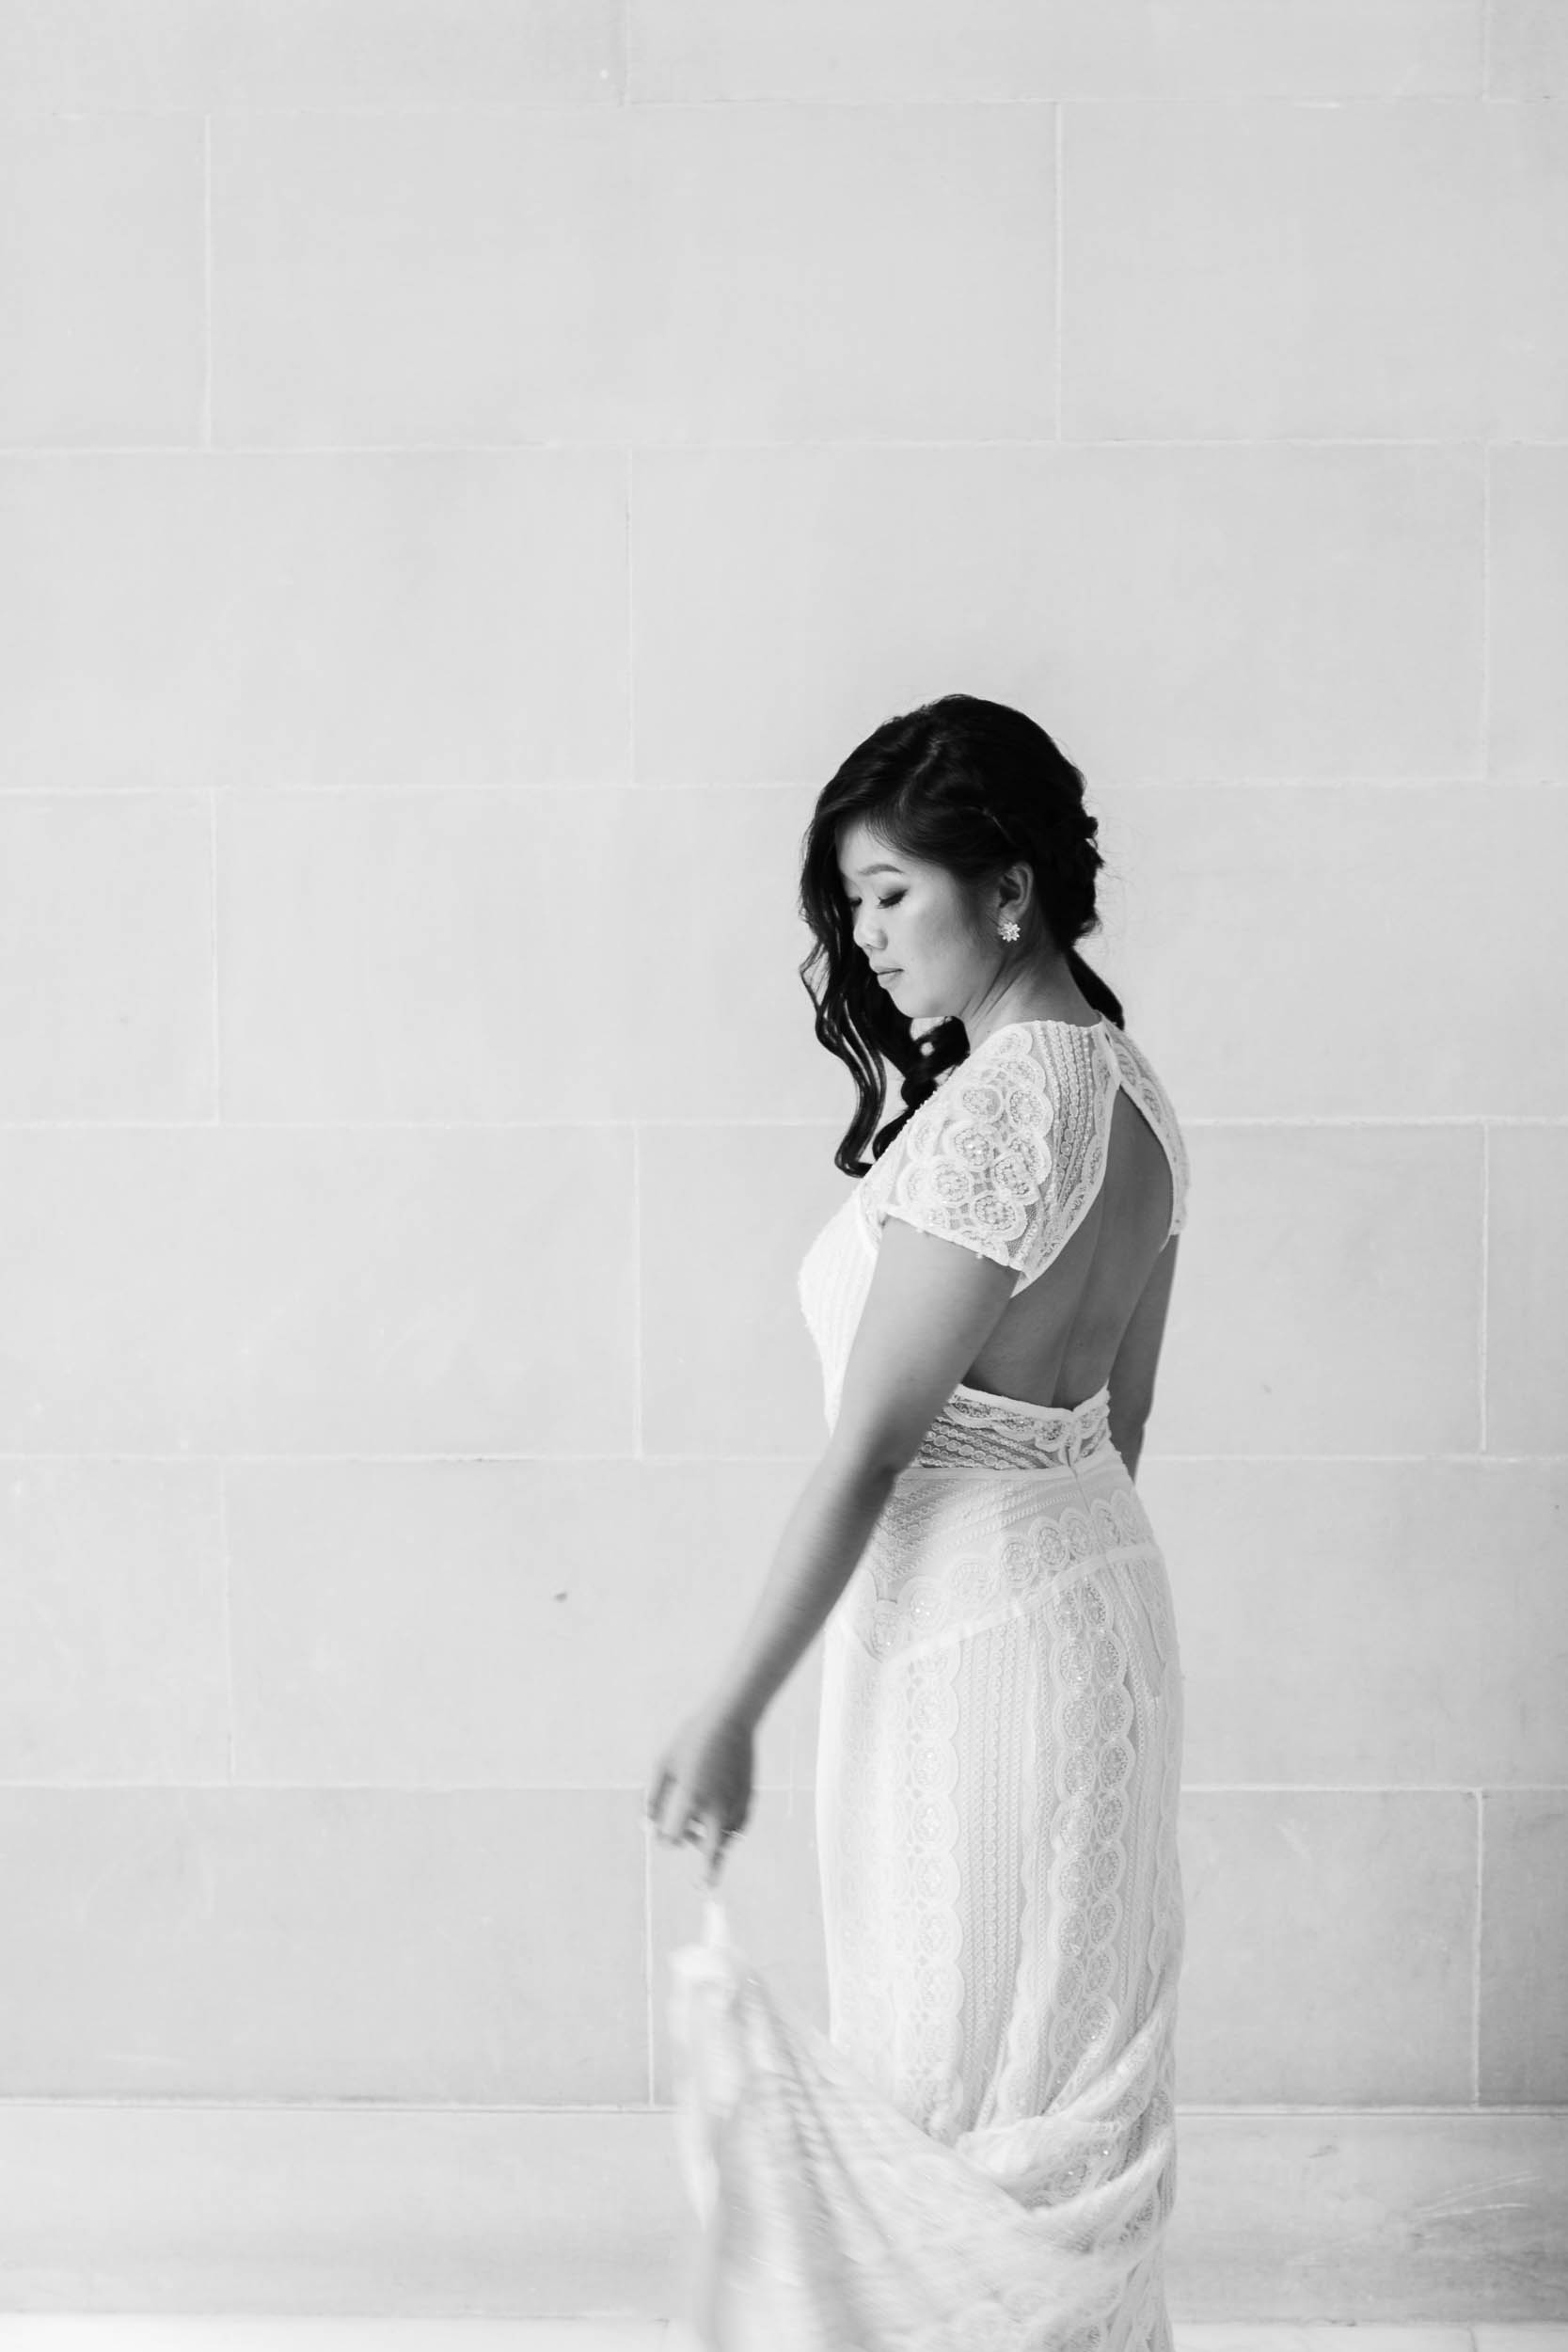 032118_M+D City Hall Wedding_Buena Lane Photography_0443-2.jpg